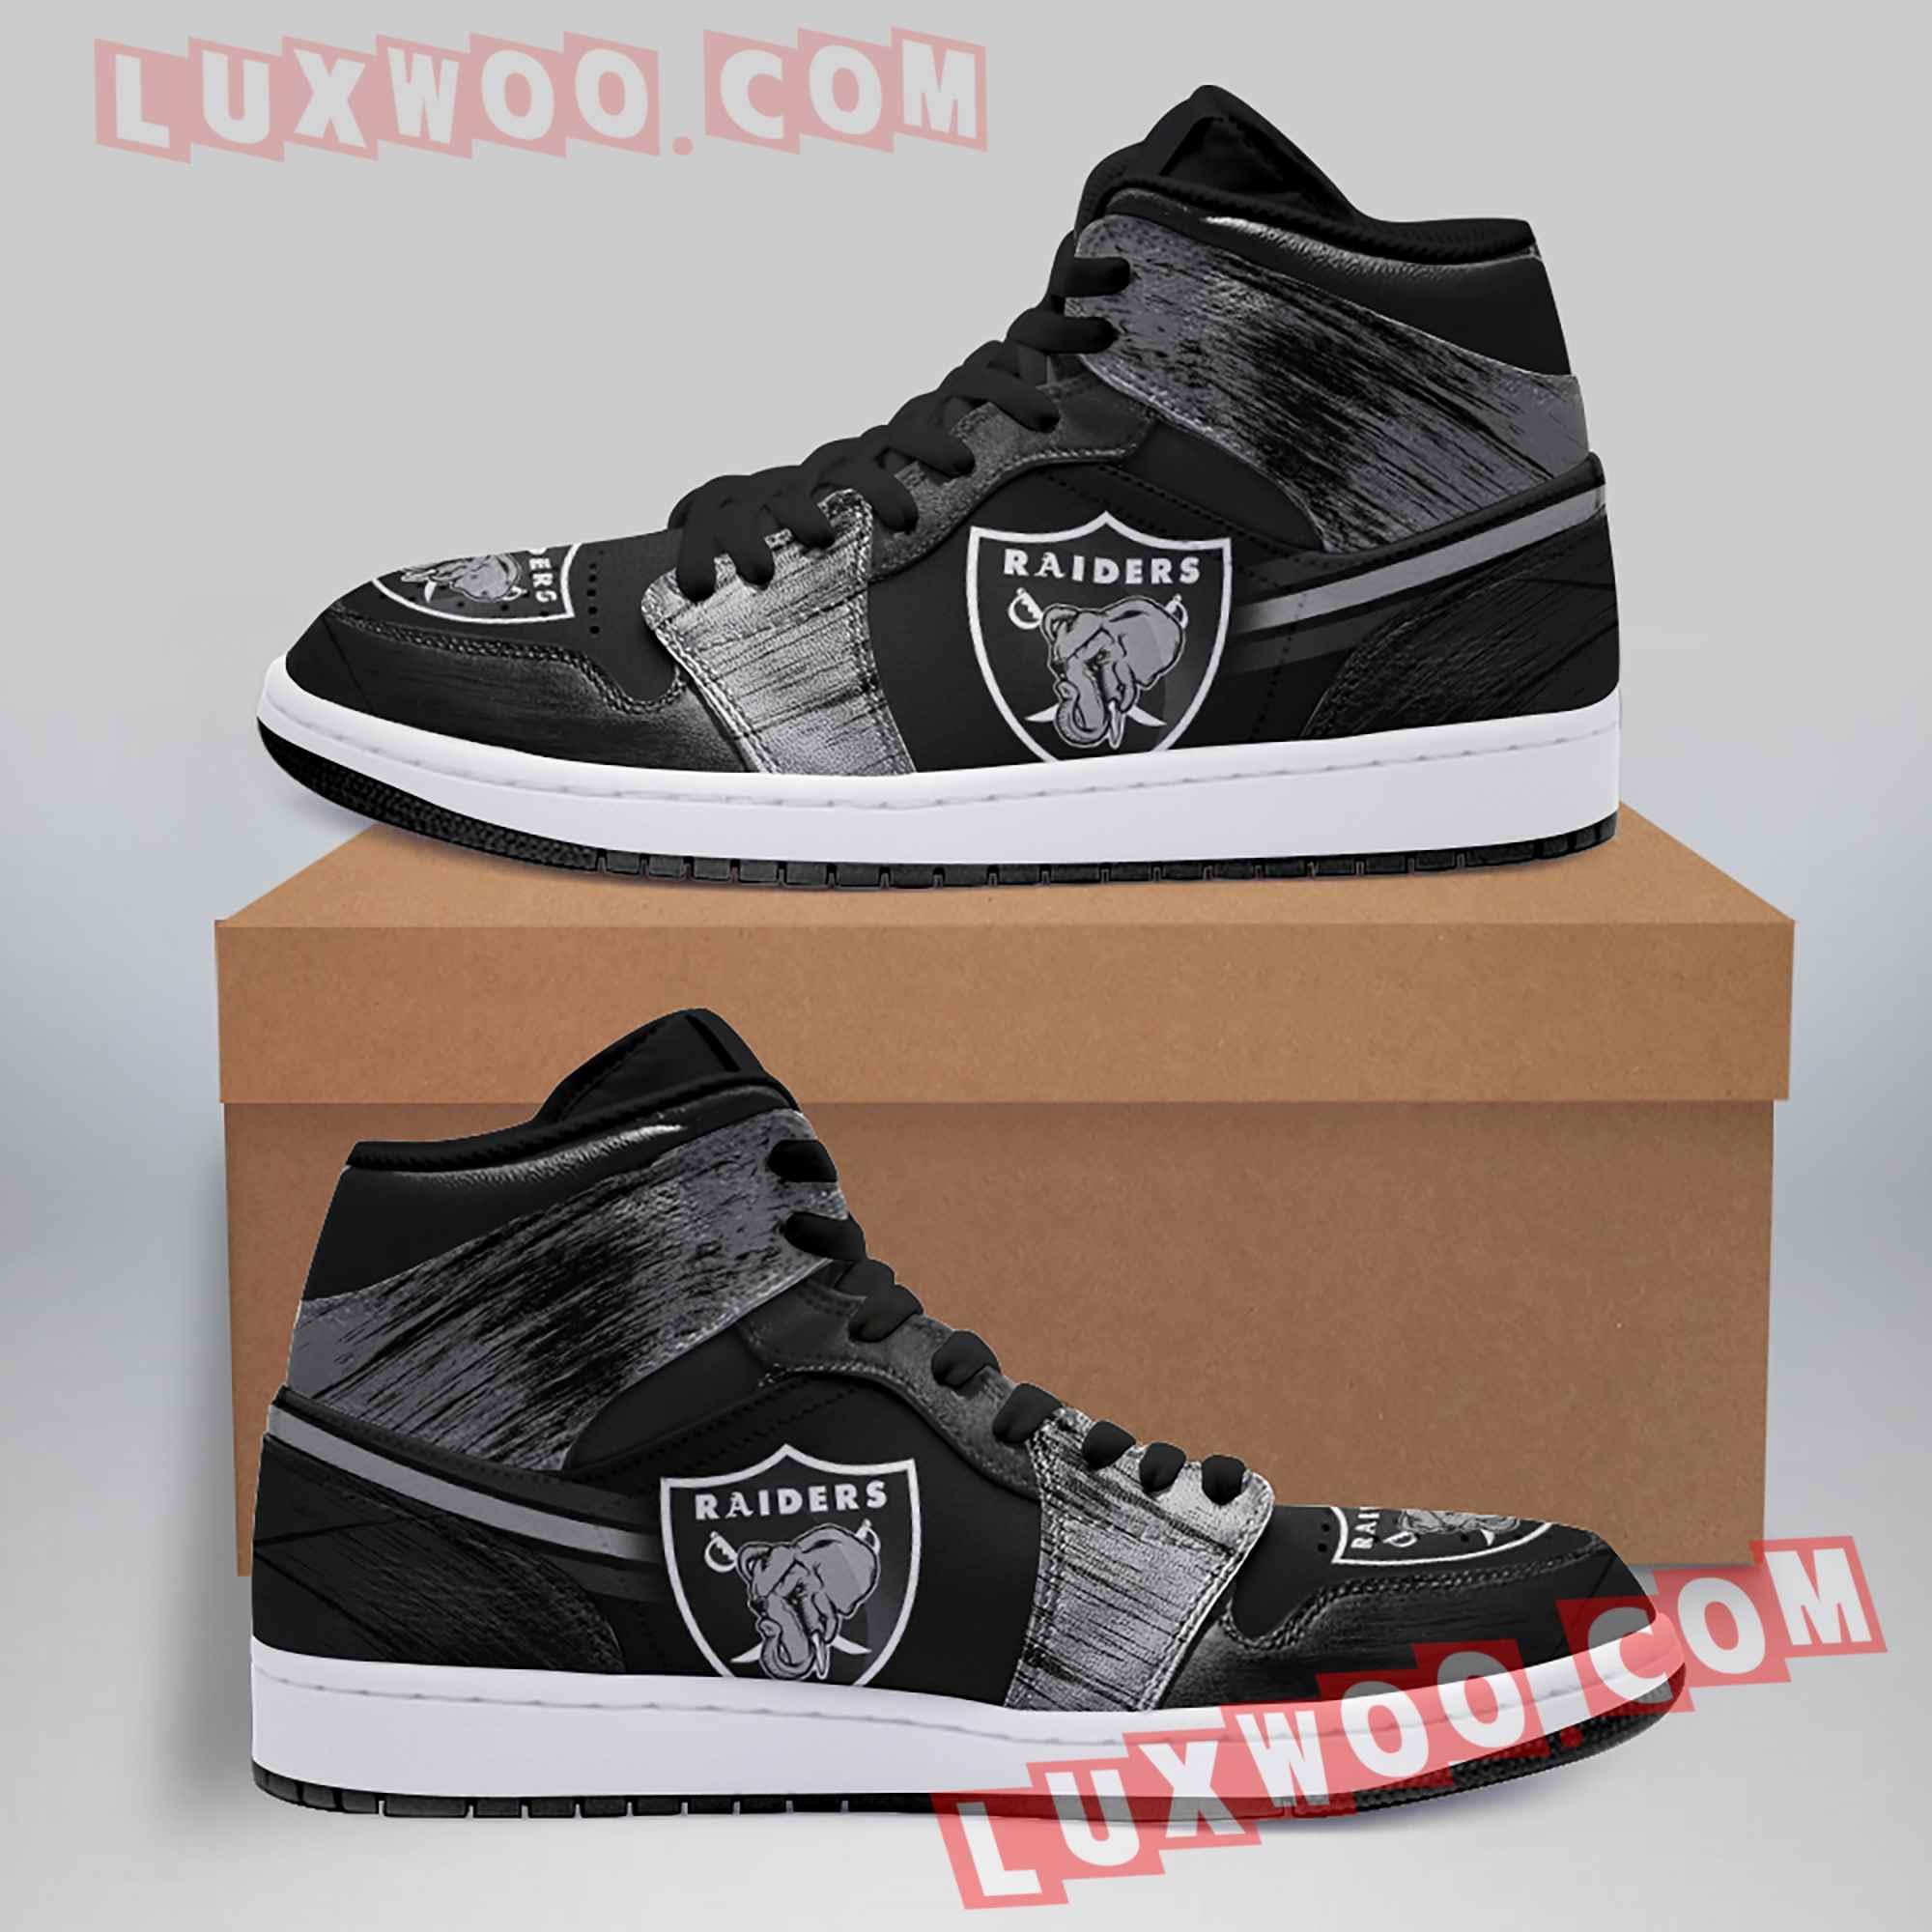 Oakland Raiders Nfl Air Jordan 1 Custom Shoes Sneaker V3